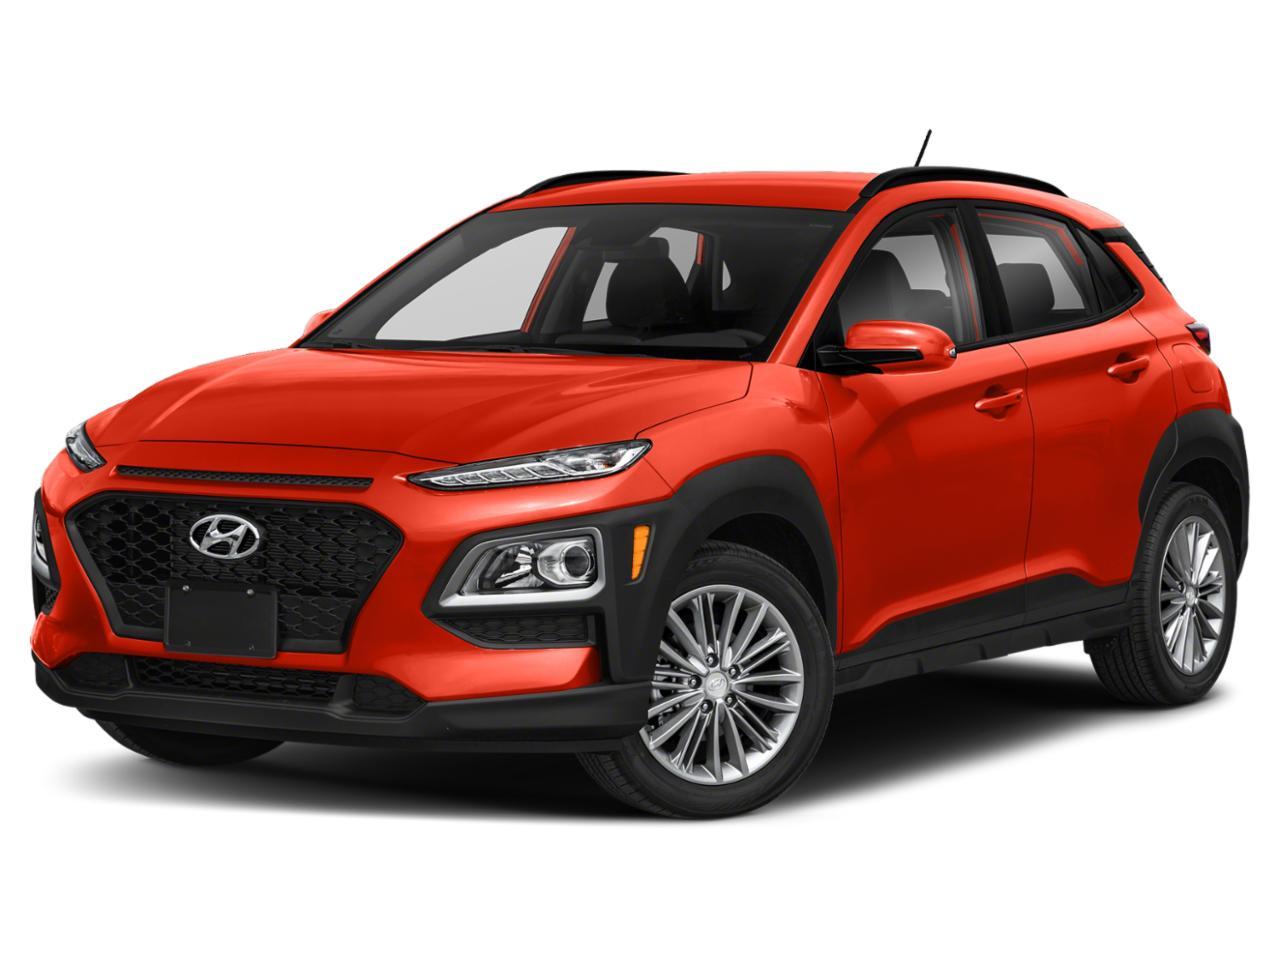 2019 Hyundai Kona Vehicle Photo in Brownsville, TX 78520